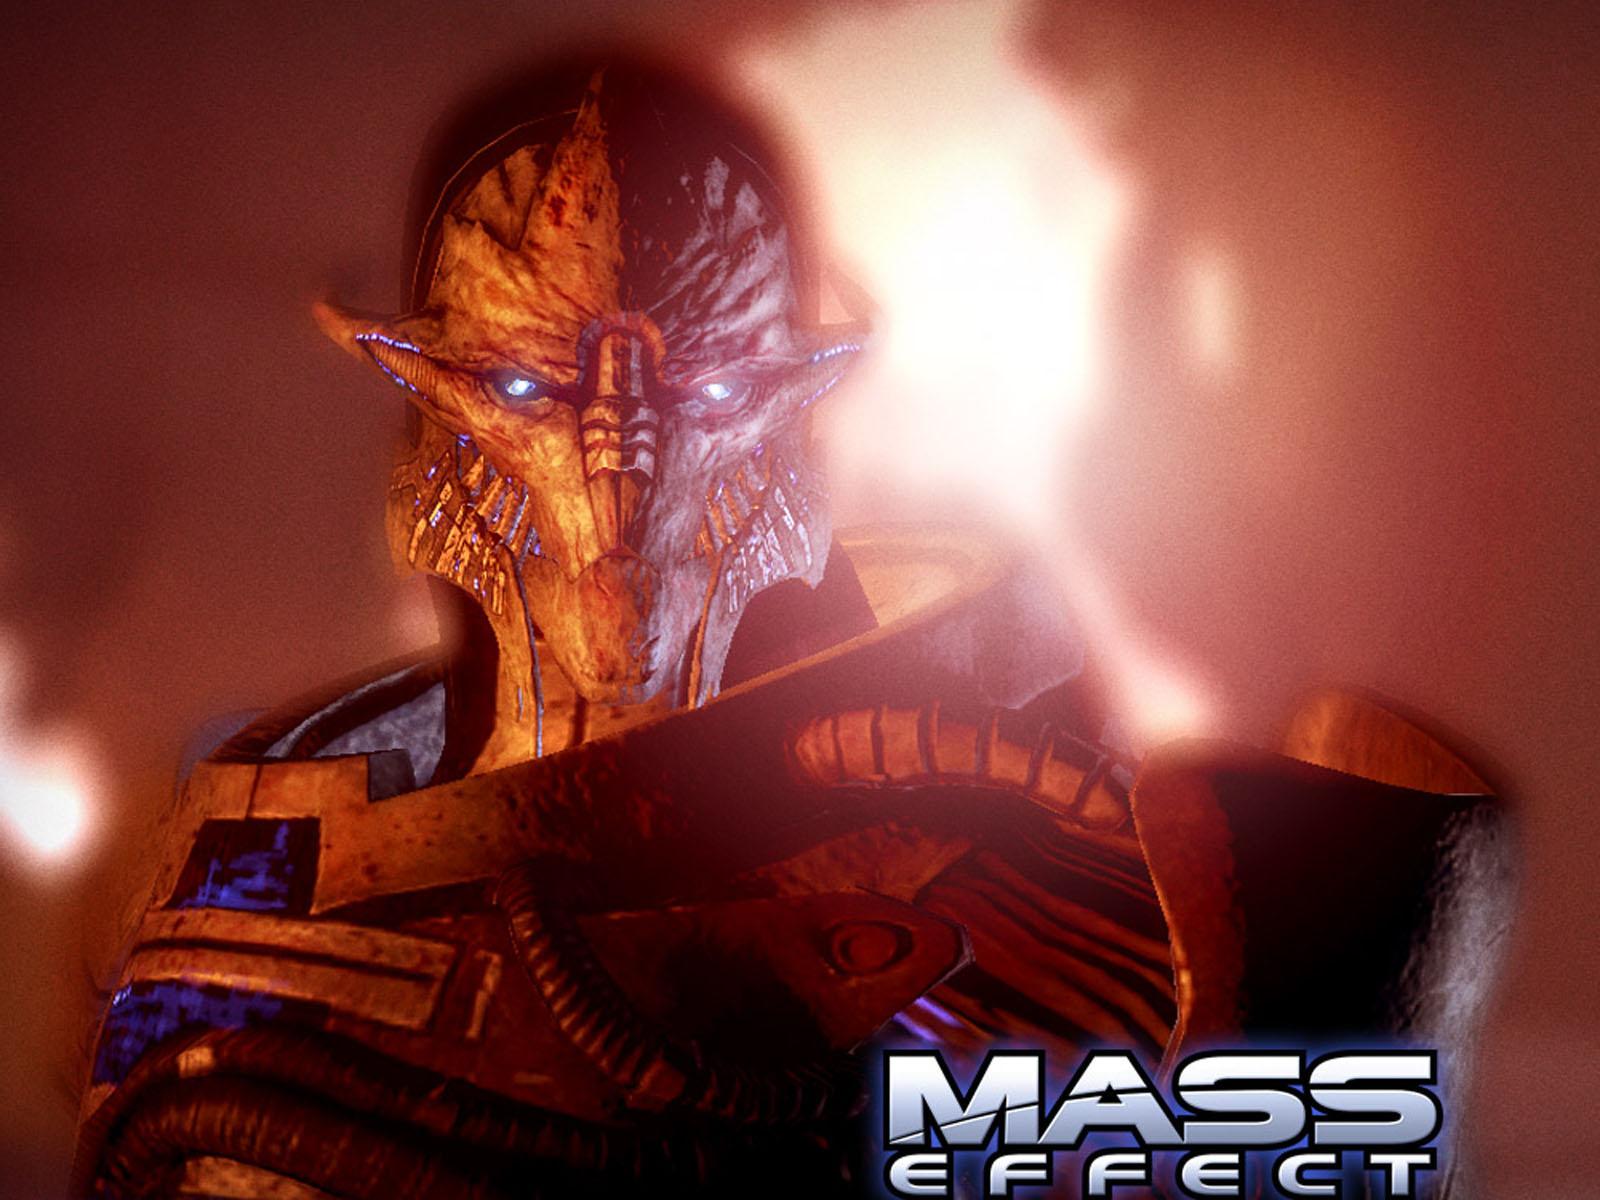 wallpapers: Mass Effect Wallpapers